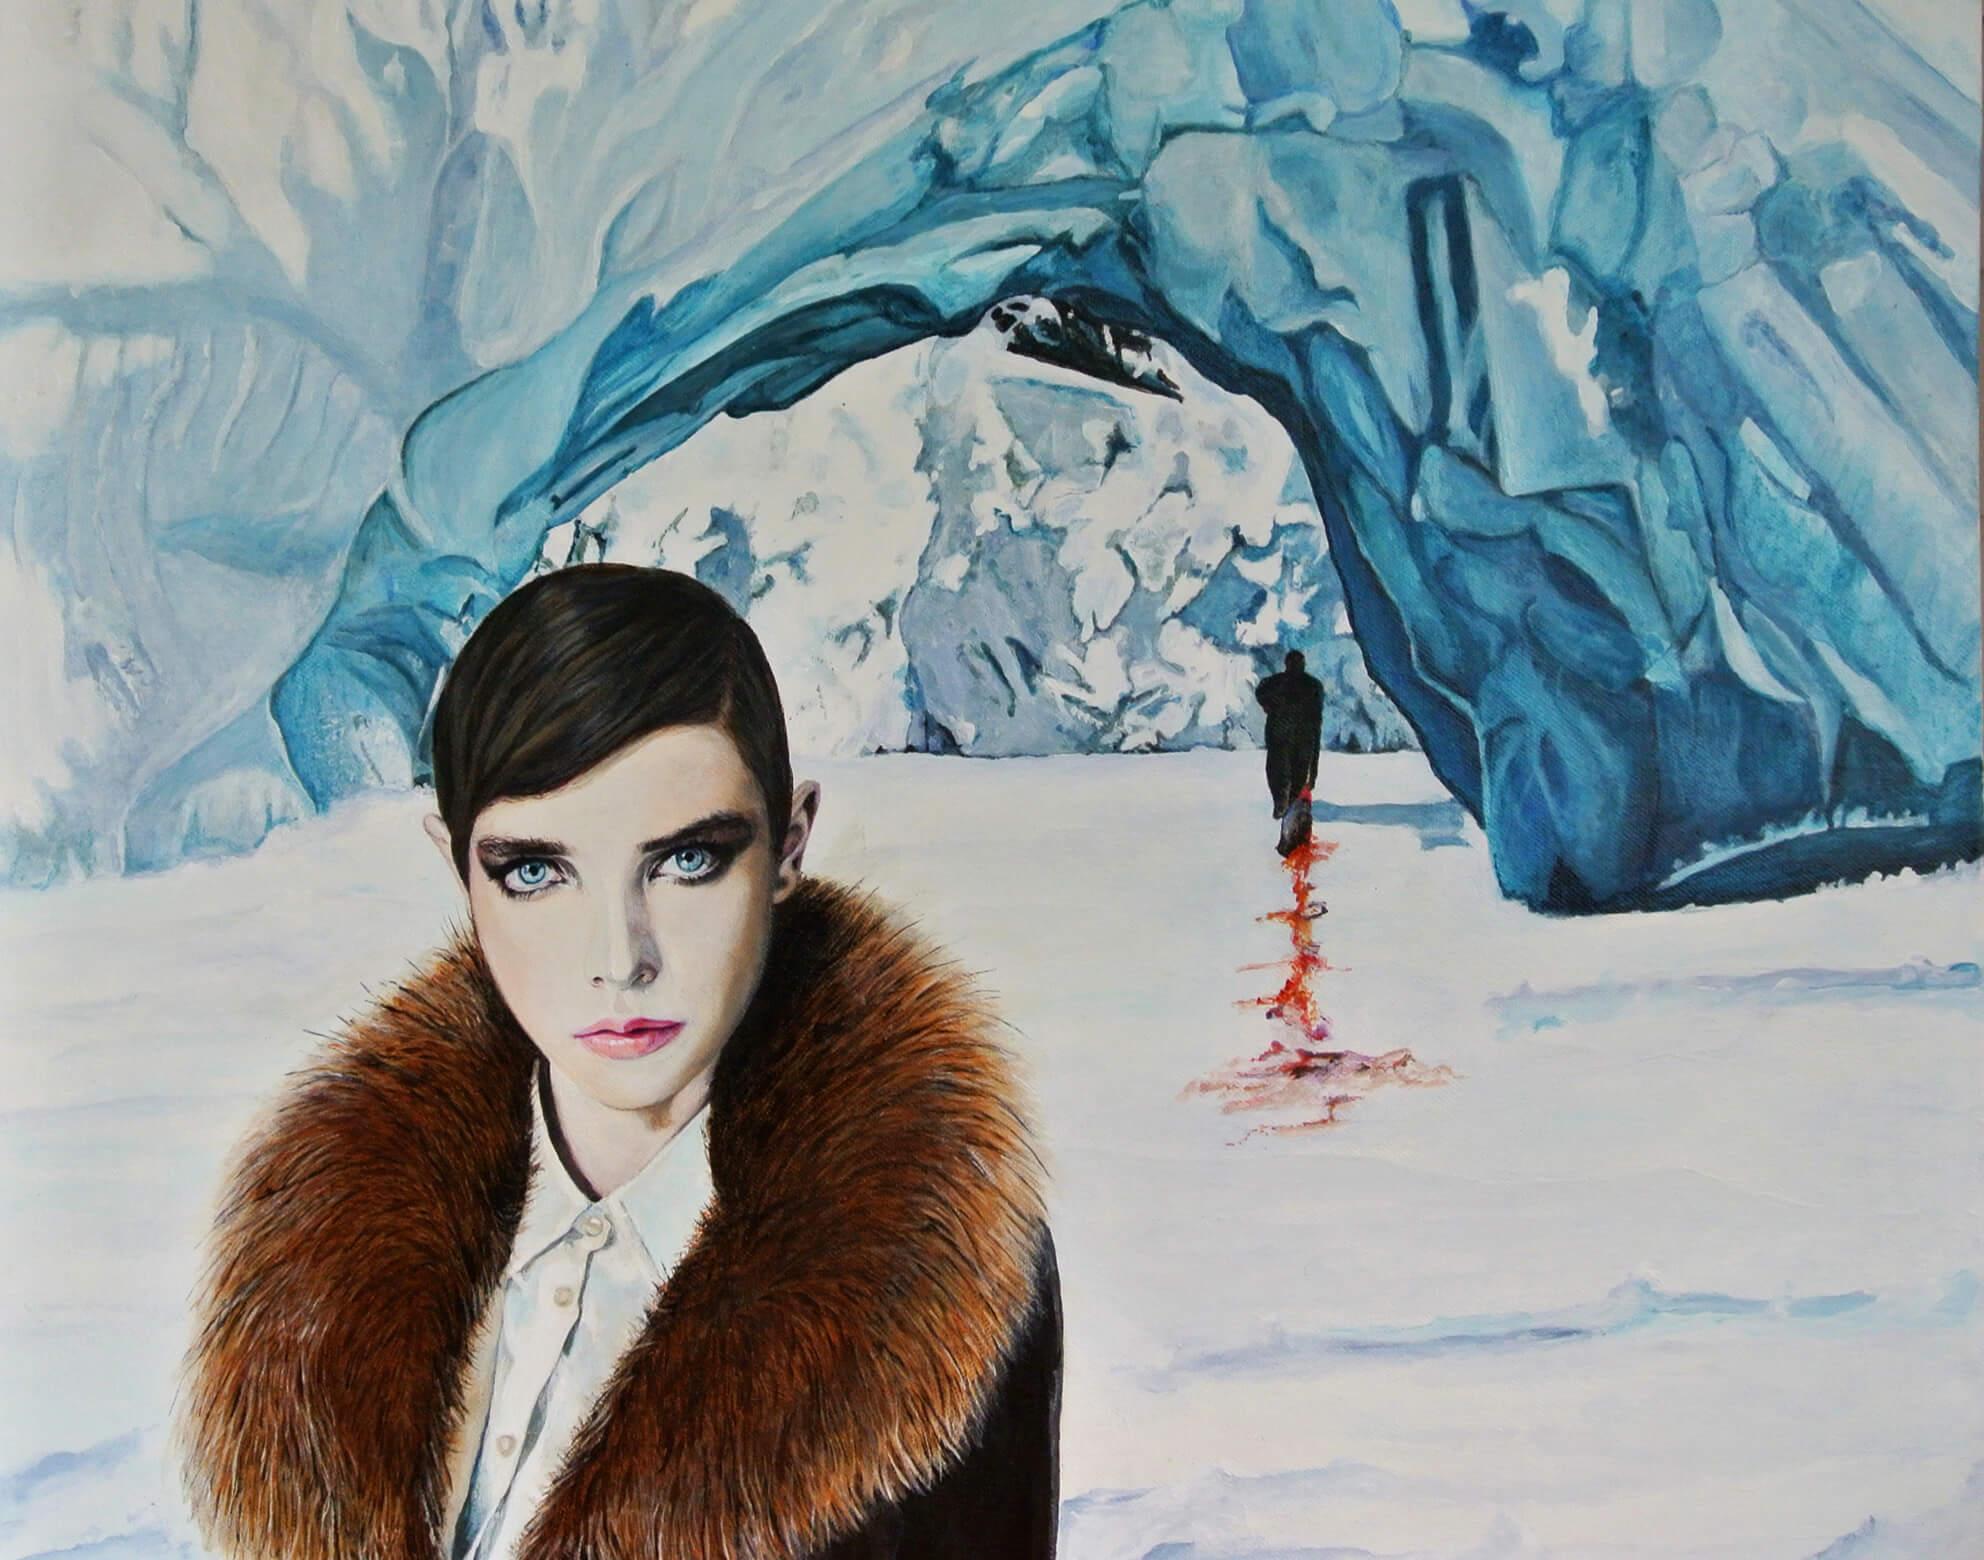 The Icequeen, 50x60x4 cm, Malerei, © Ute Latzke, 2015, Preis: 1100 Euro.